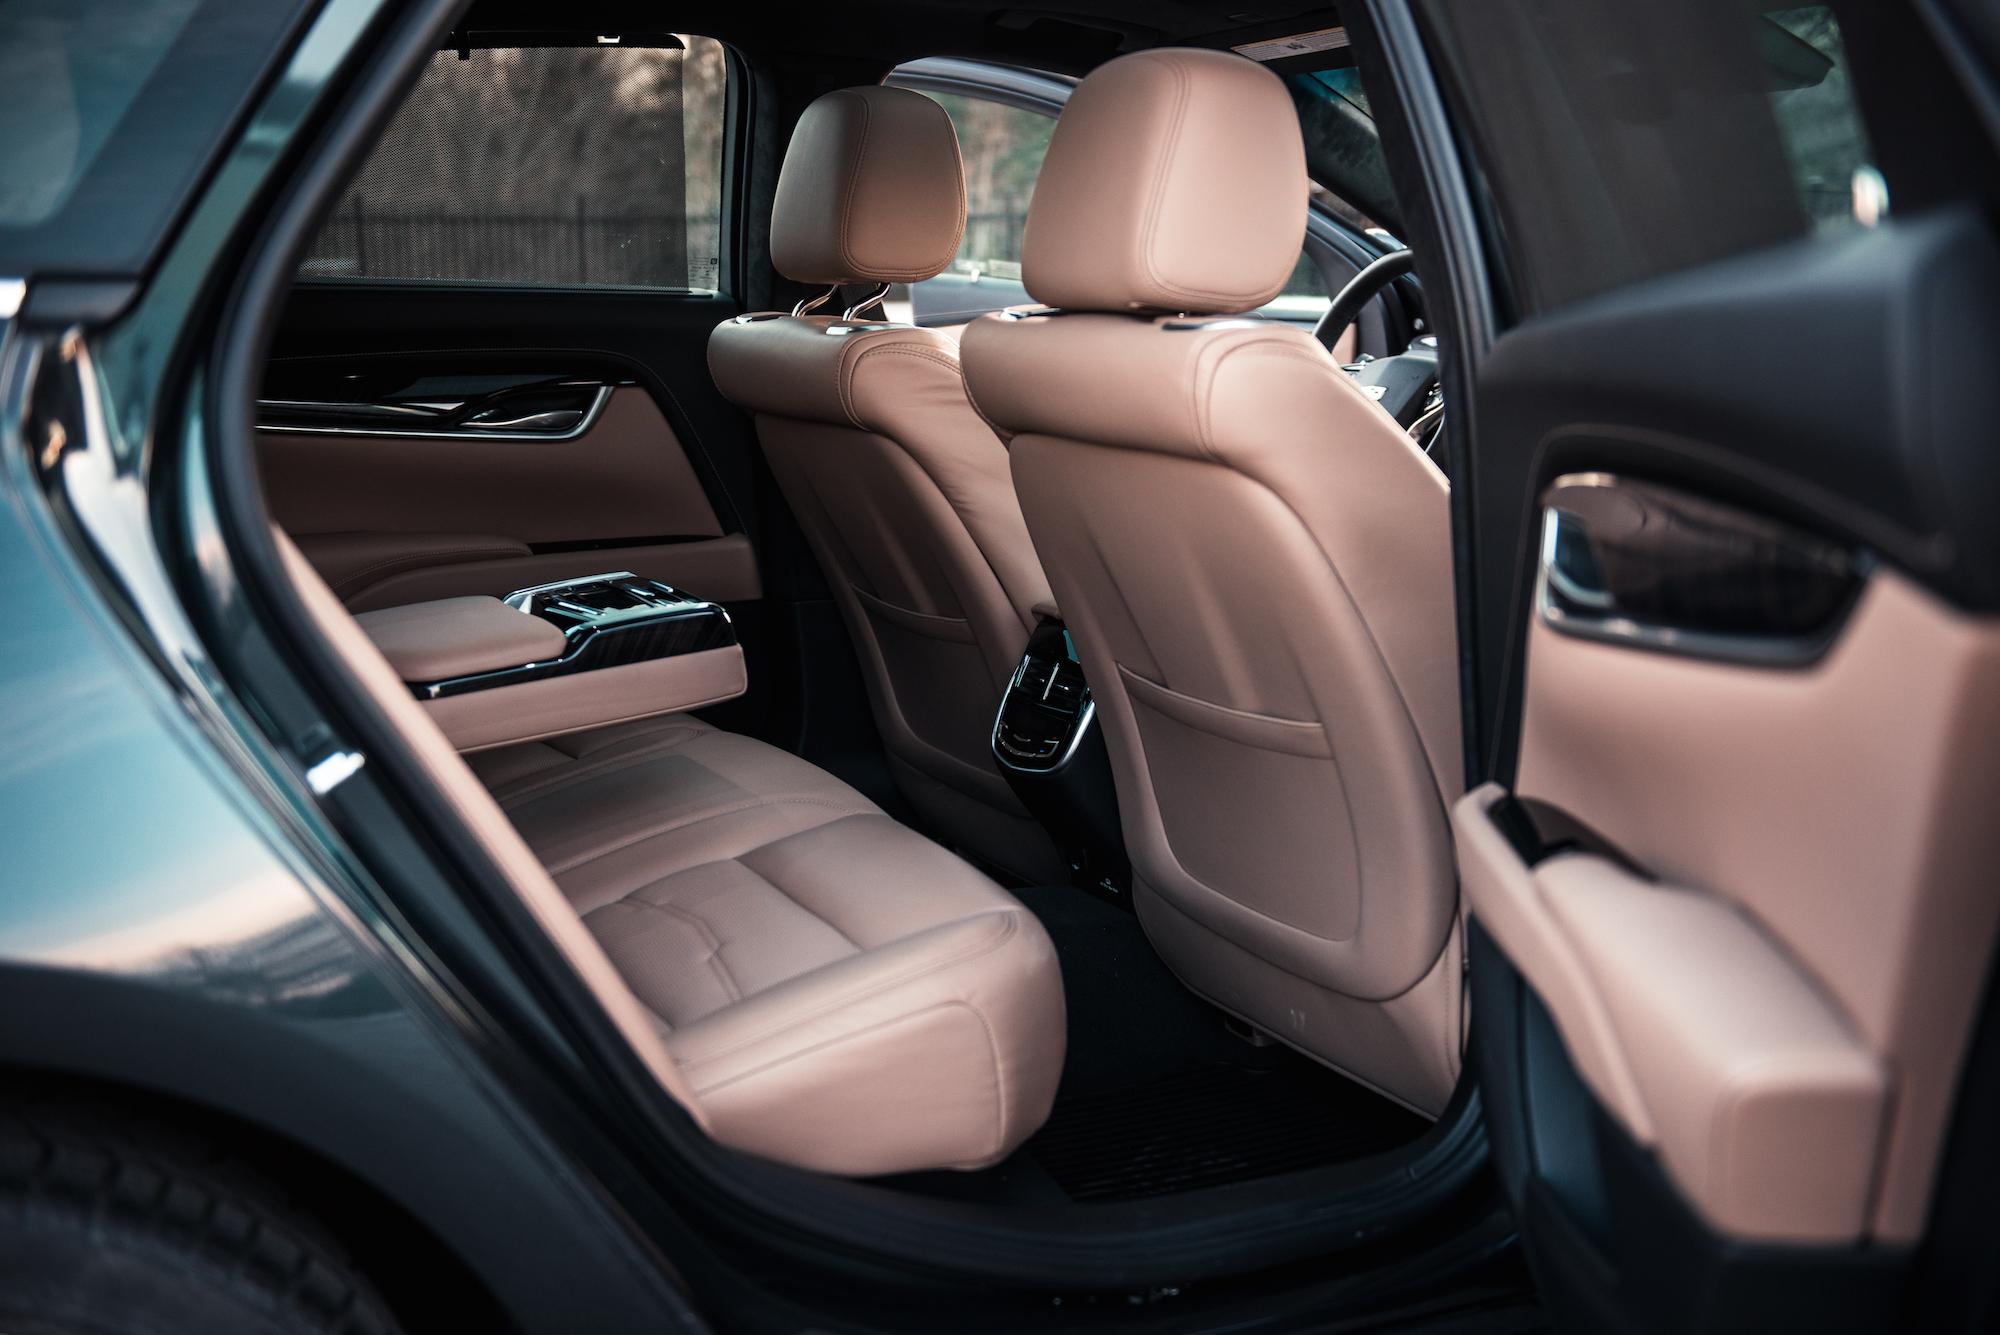 2017 Cadillac Cts 3.6 L Premium Luxury >> Review: 2018 Cadillac XTS V-Sport Platinum | CAR